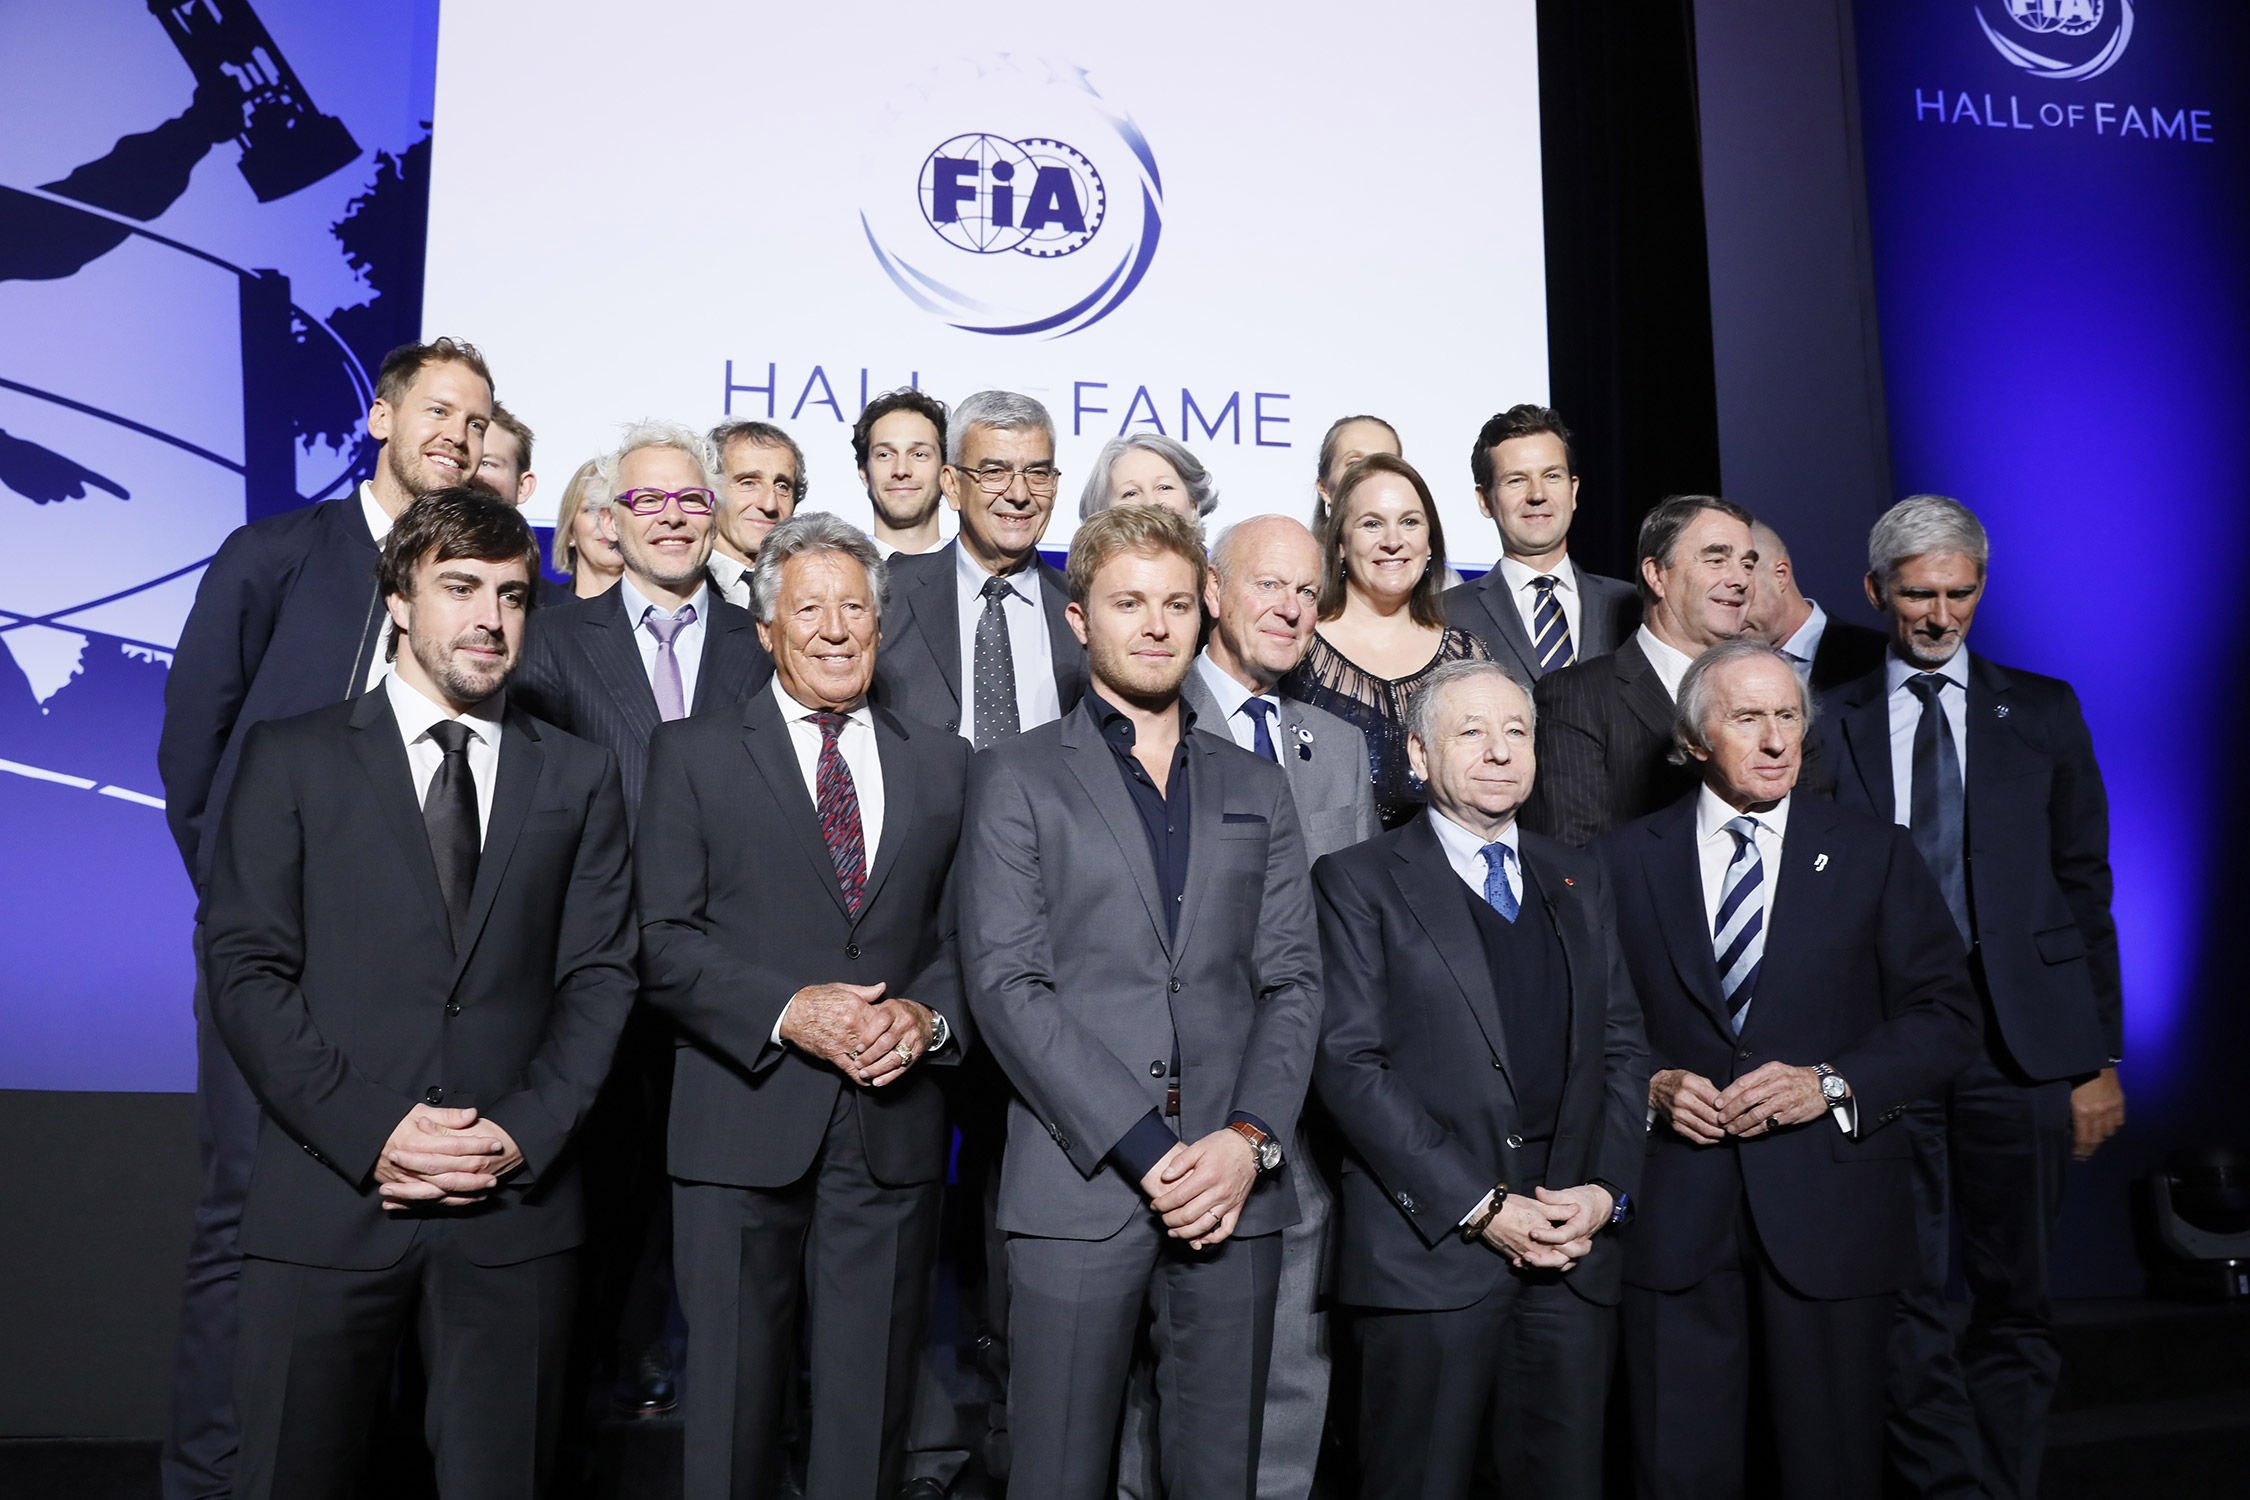 La FIA inaugure son Hall of Fame